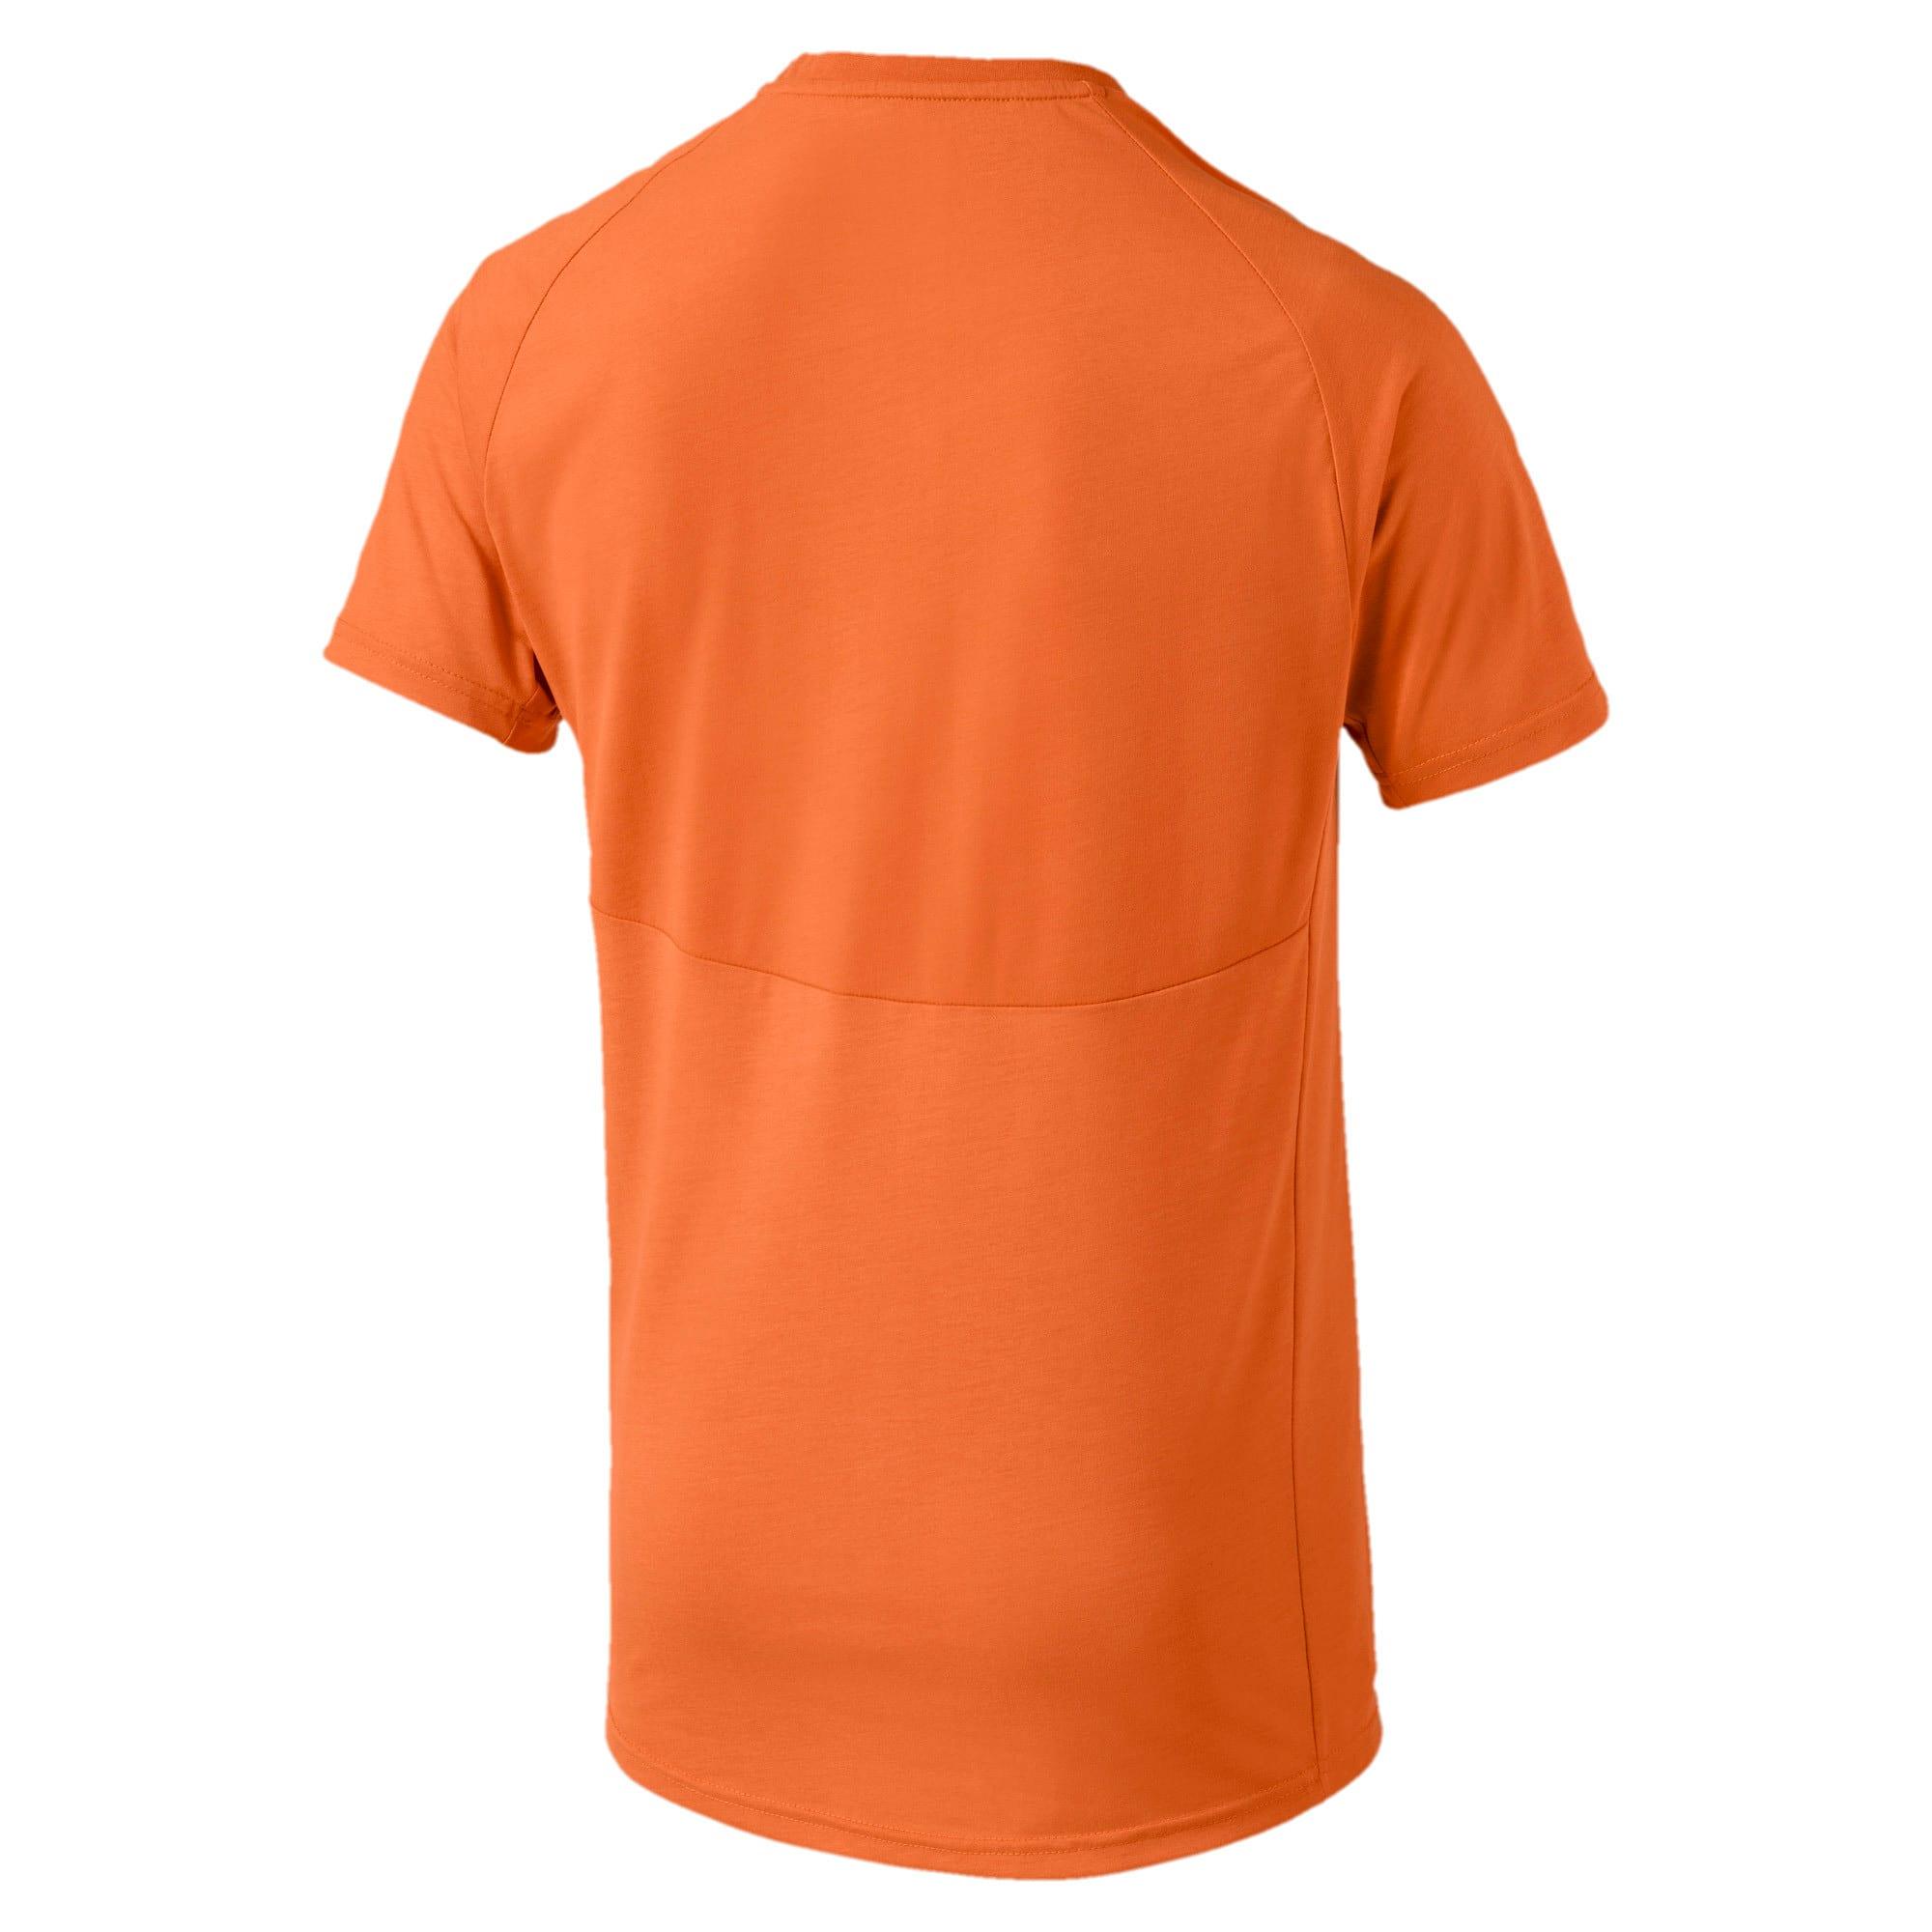 Thumbnail 5 of Meska koszulka z krótkim rekawem Evostripe, Jaffa Orange, medium